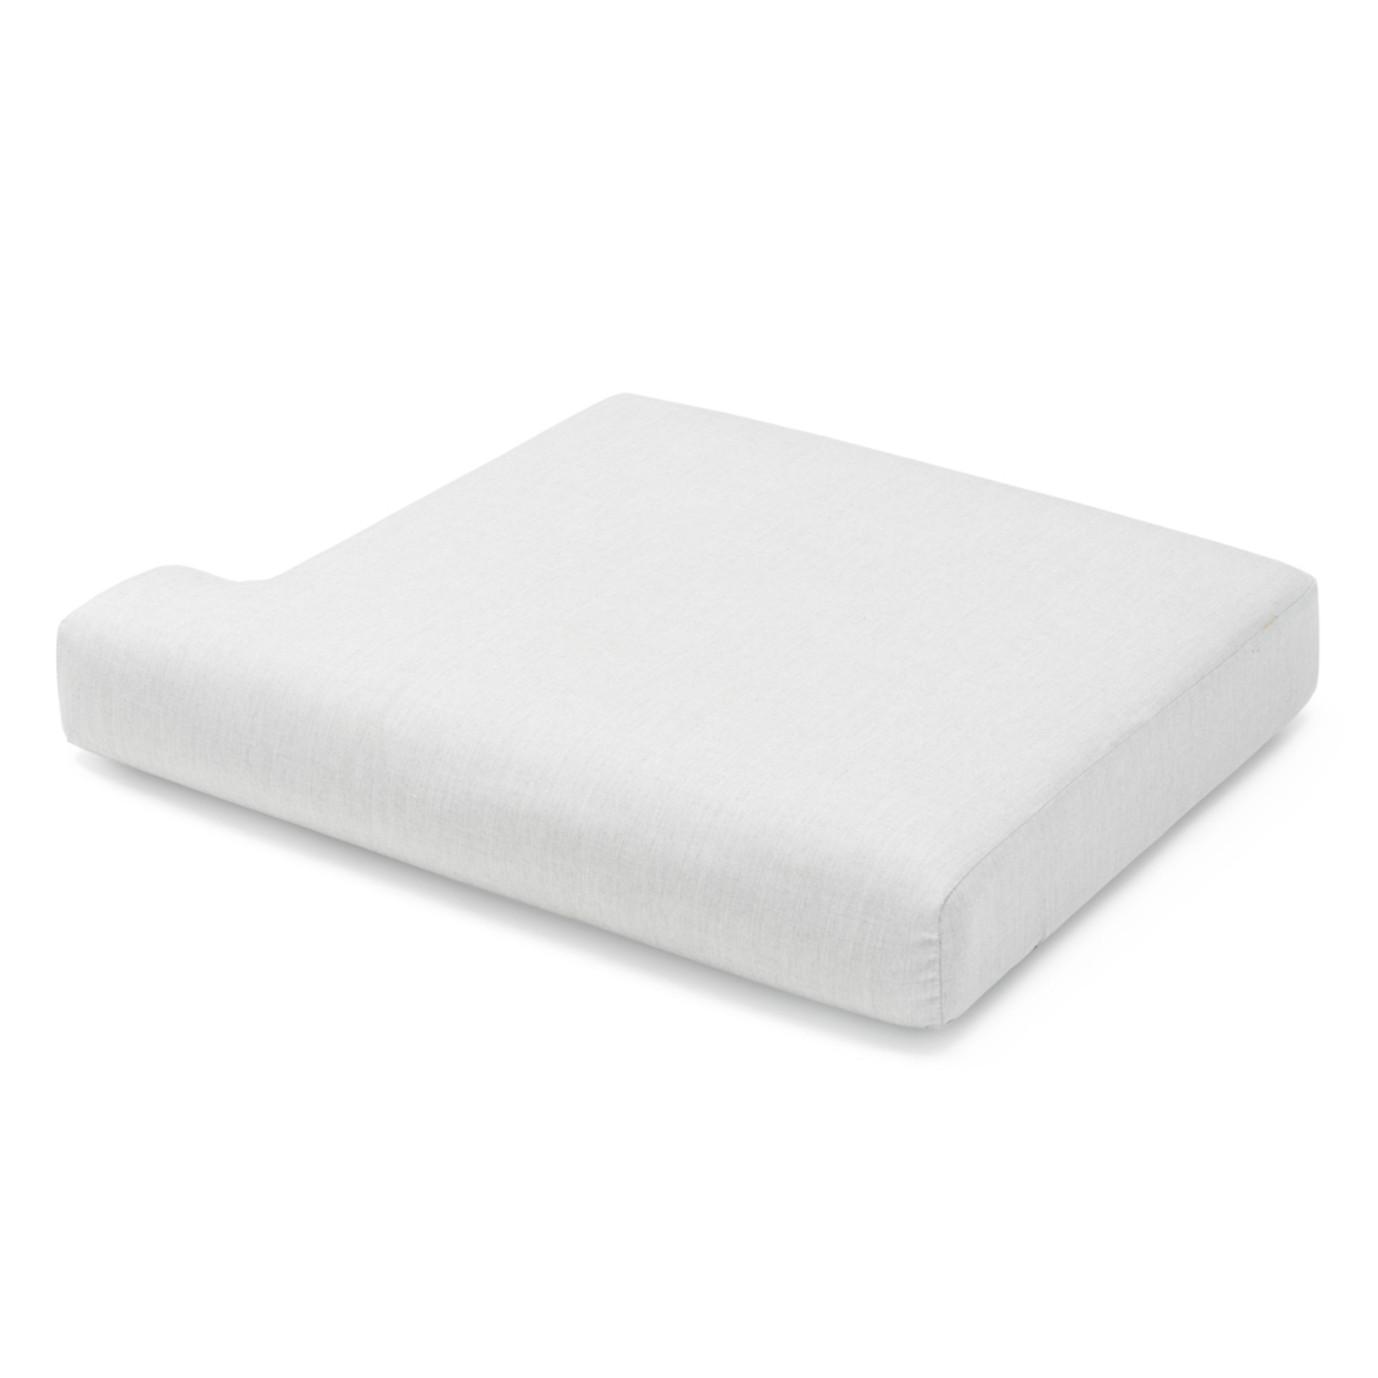 Portofino Sling 71in Loveseat Right Base Cushion - Space Gray